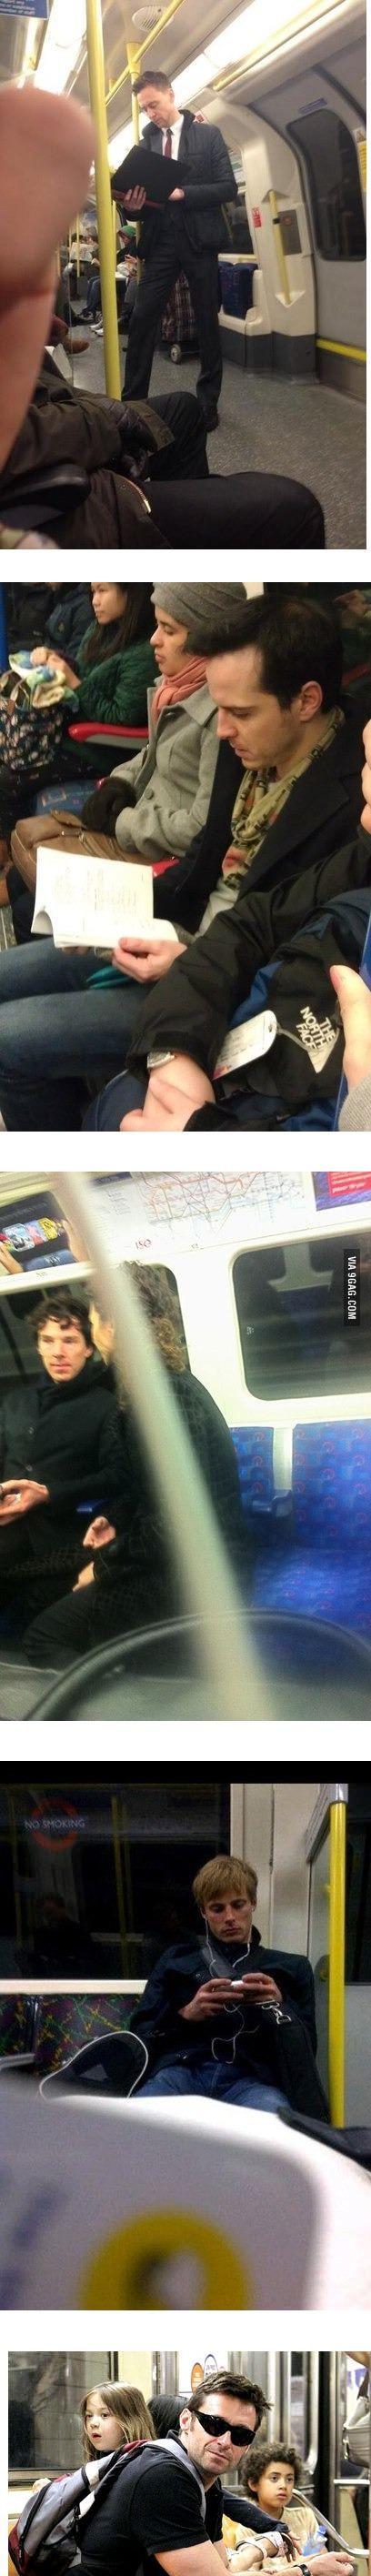 That's it, I am moving to London! ~ Tom Hiddleston (Loki), Andrew Scott (Moriarty), Benedict Cumerbatch (Sherlock), Bradley James (Arthur), Hugh Jackman (Wolverine)